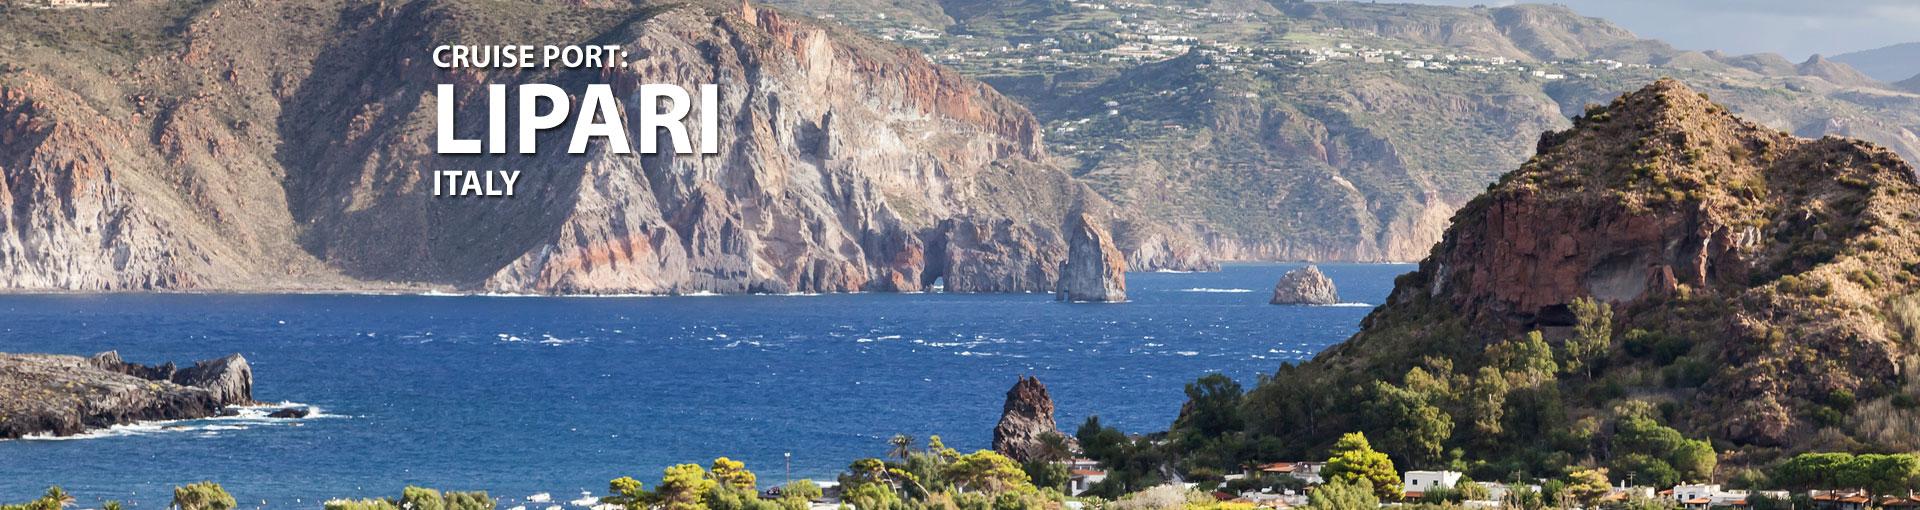 Cruises to Lipari, Italy